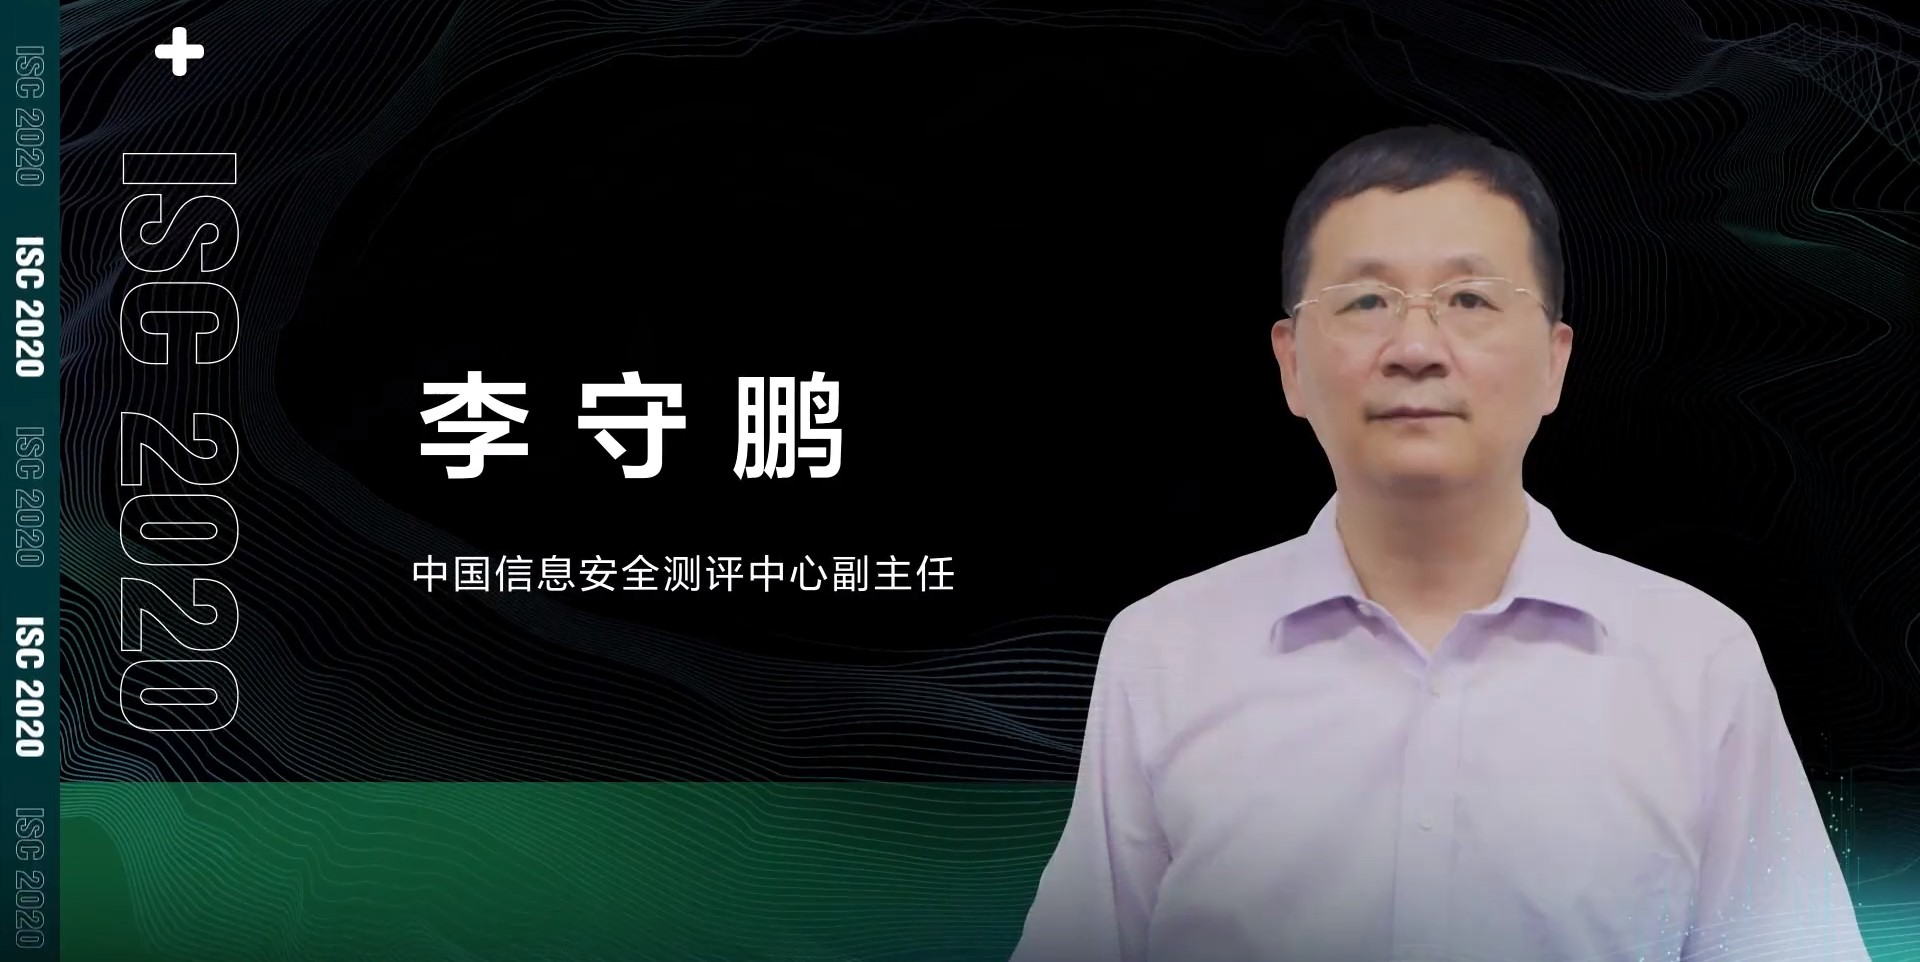 ISC2020李守鹏:漫谈网络安全风险与态势感知